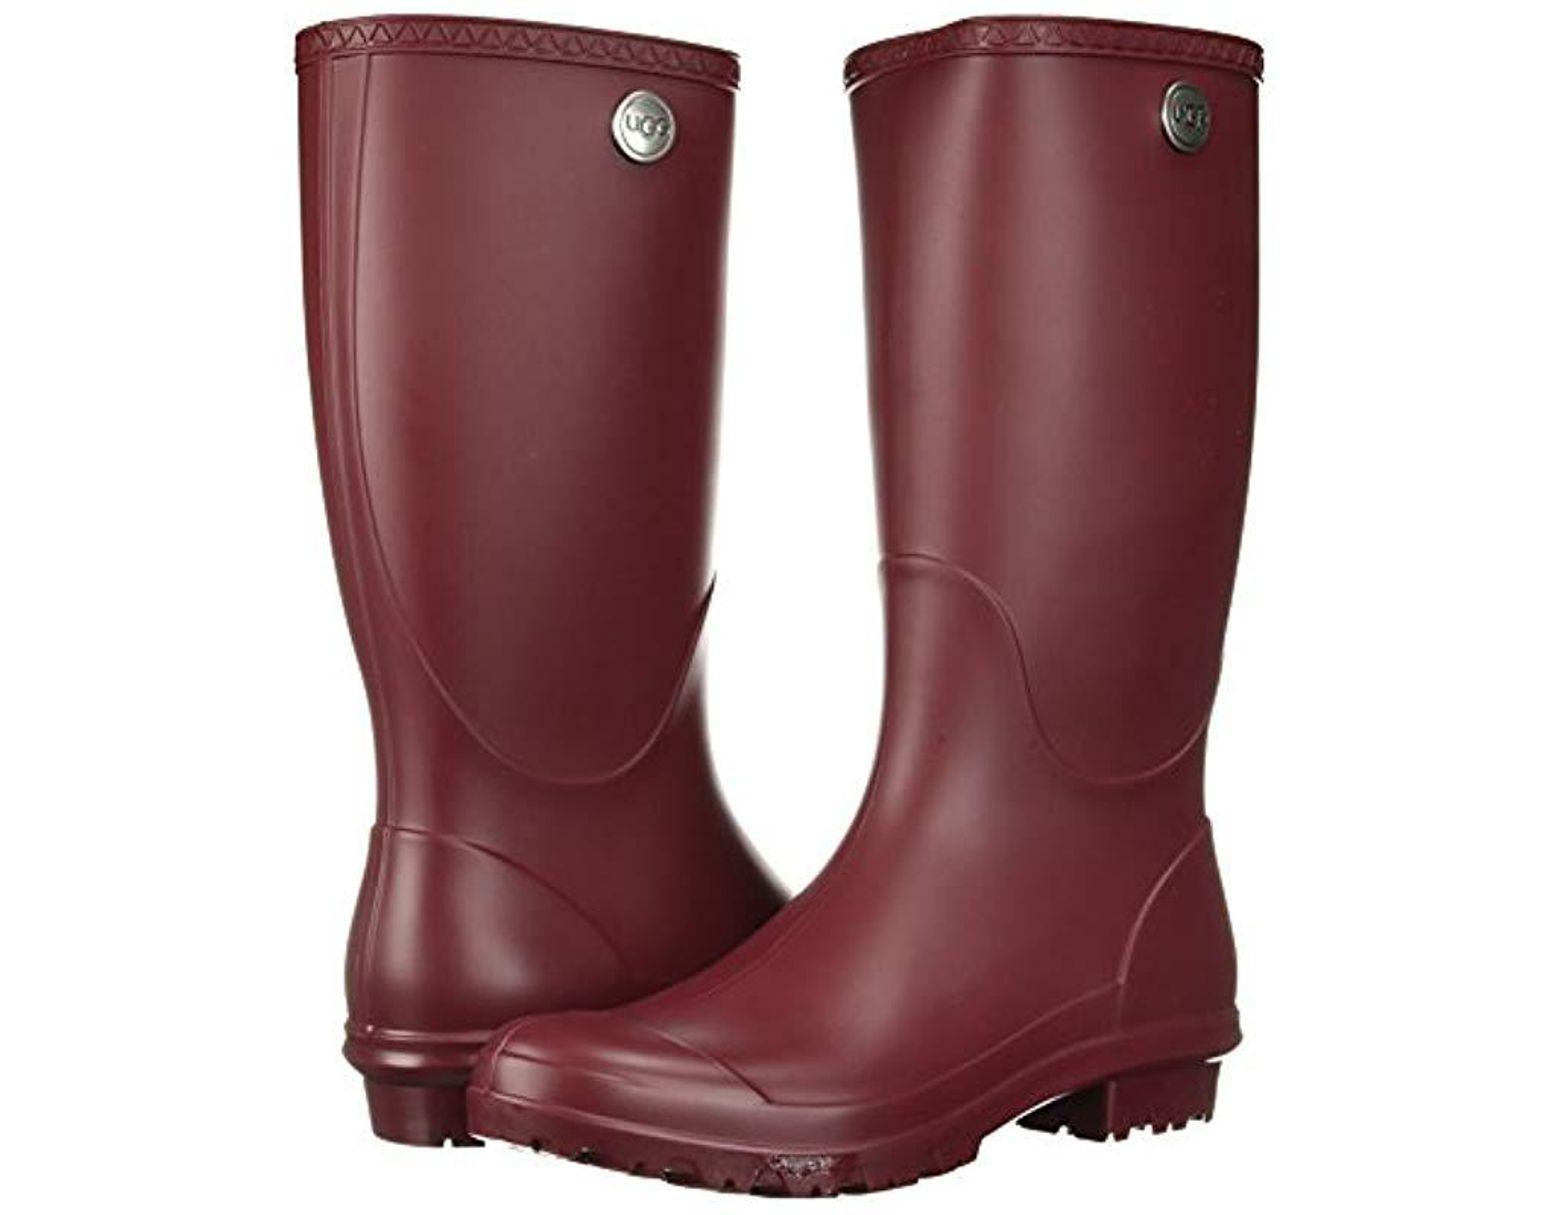 55a38e7bede Women's Red Shelby Matte Rain Boots